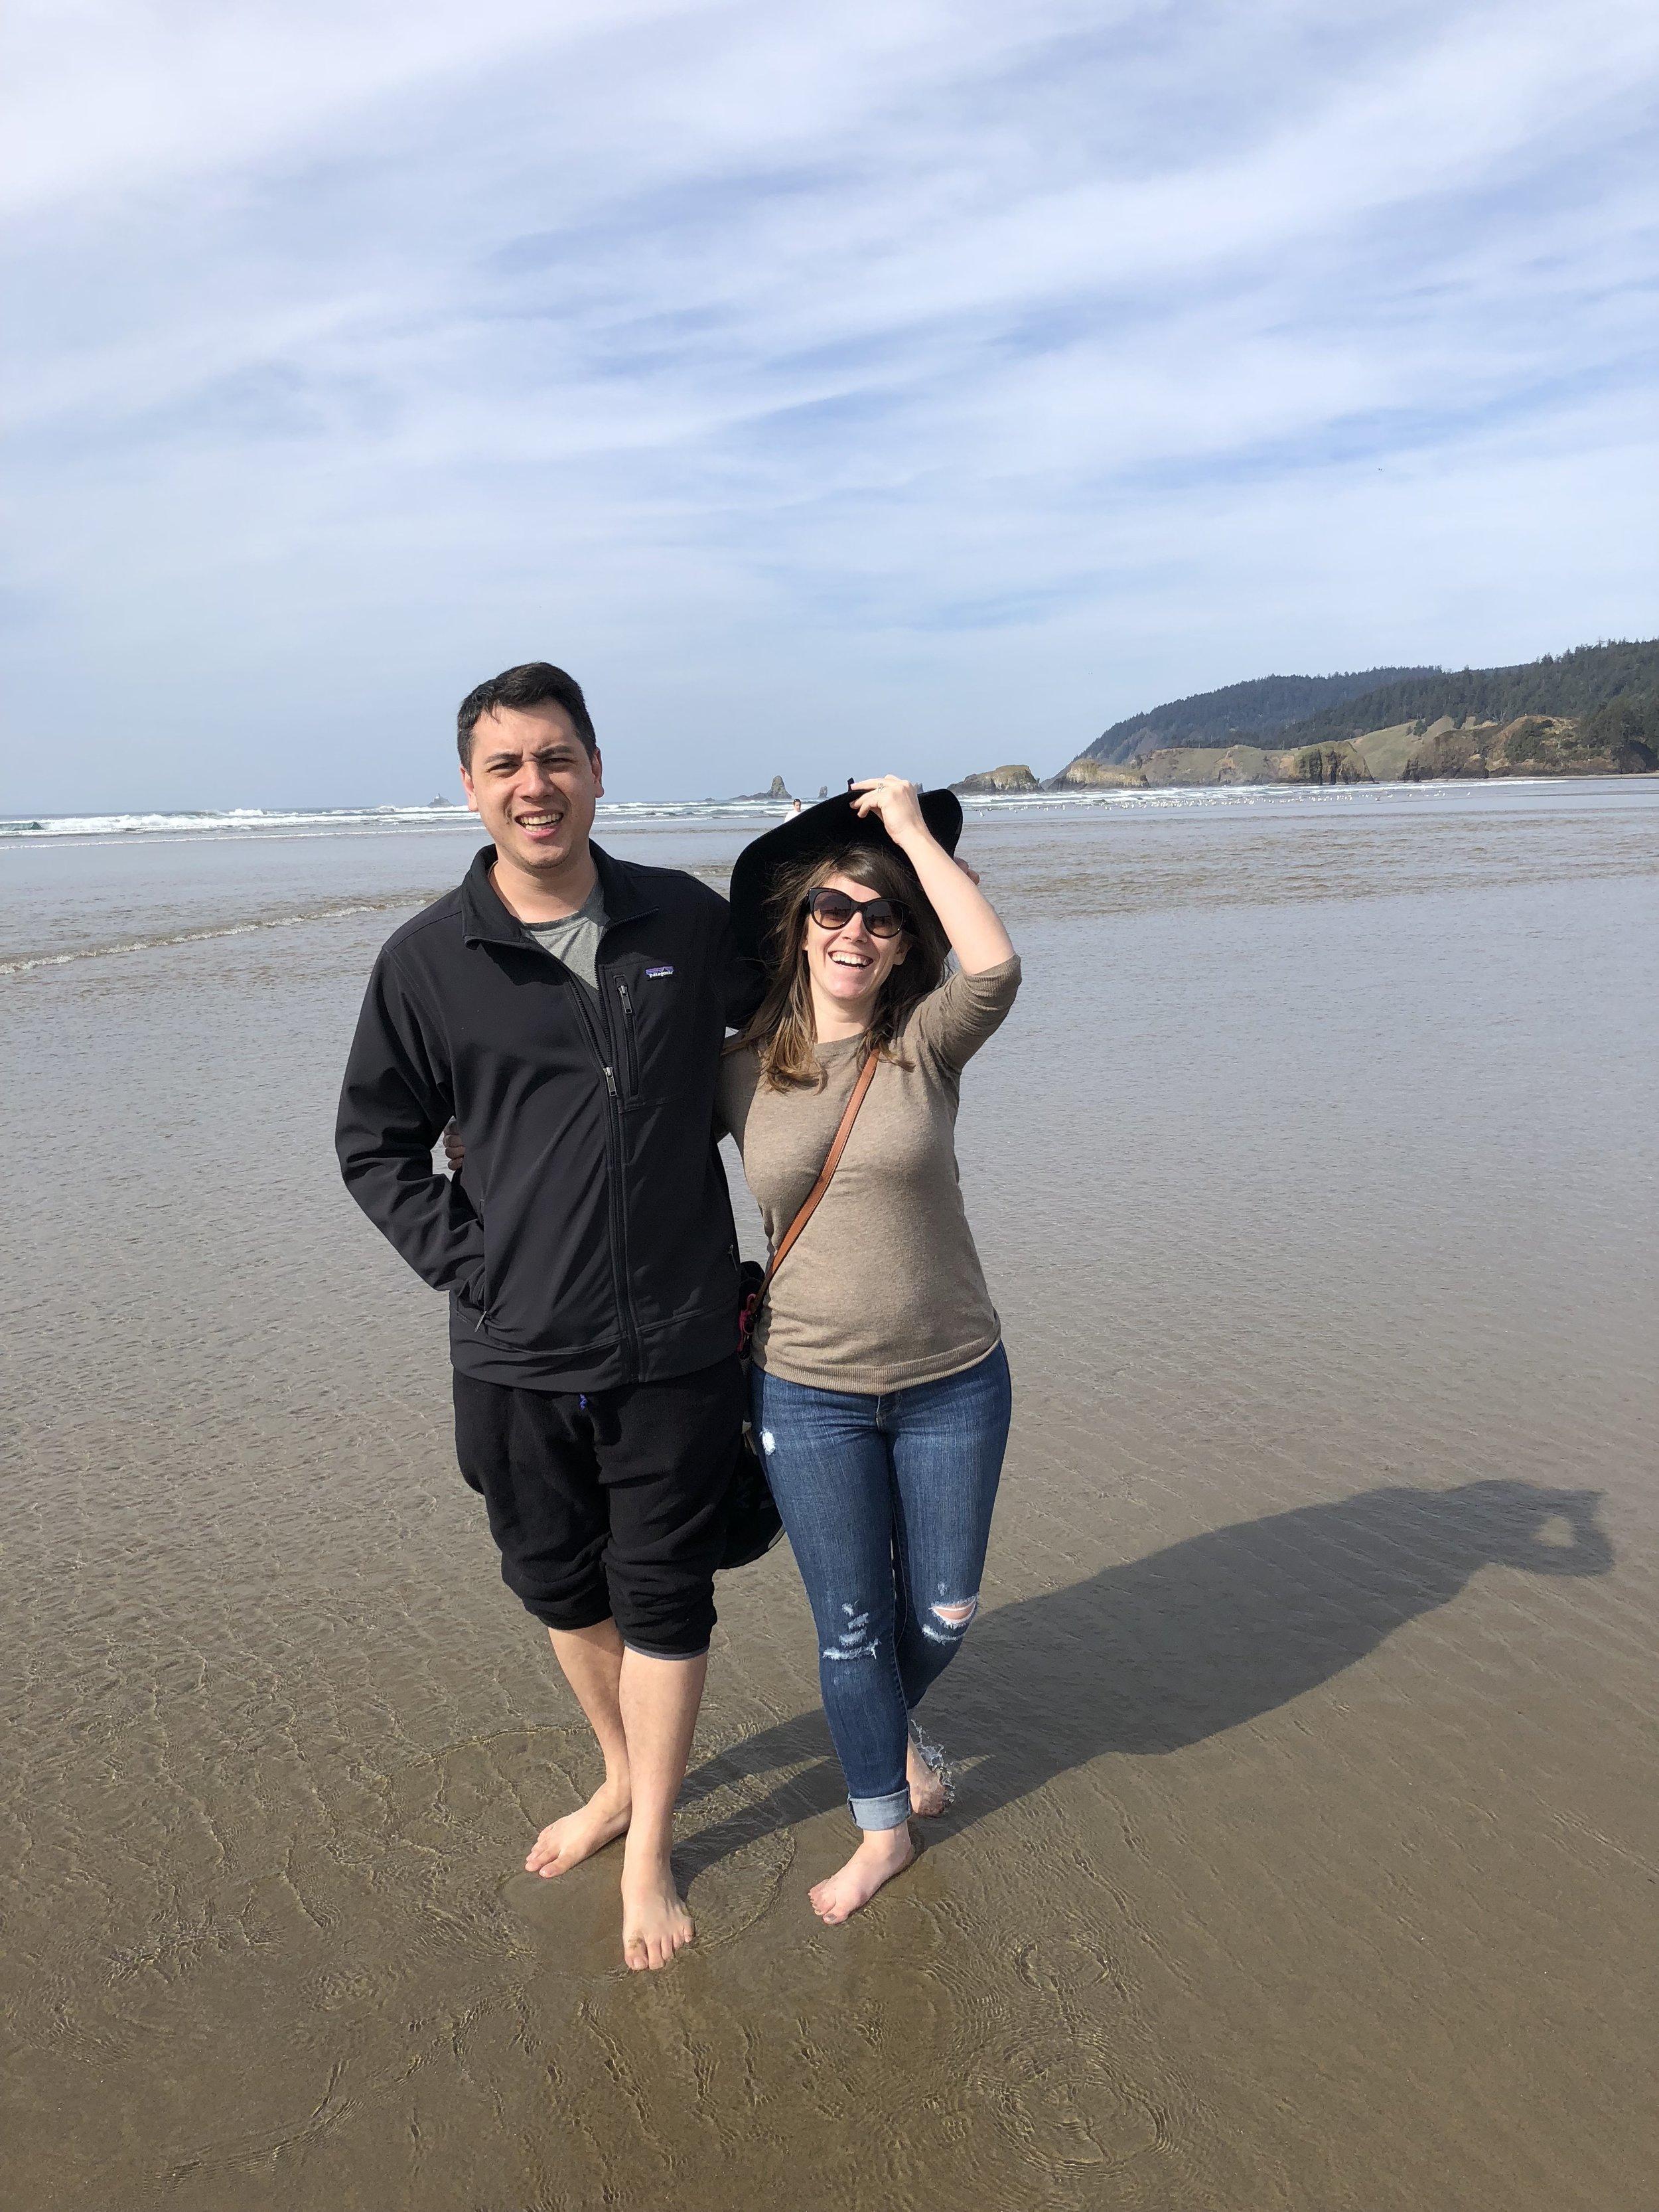 Cannon Beach2.JPG